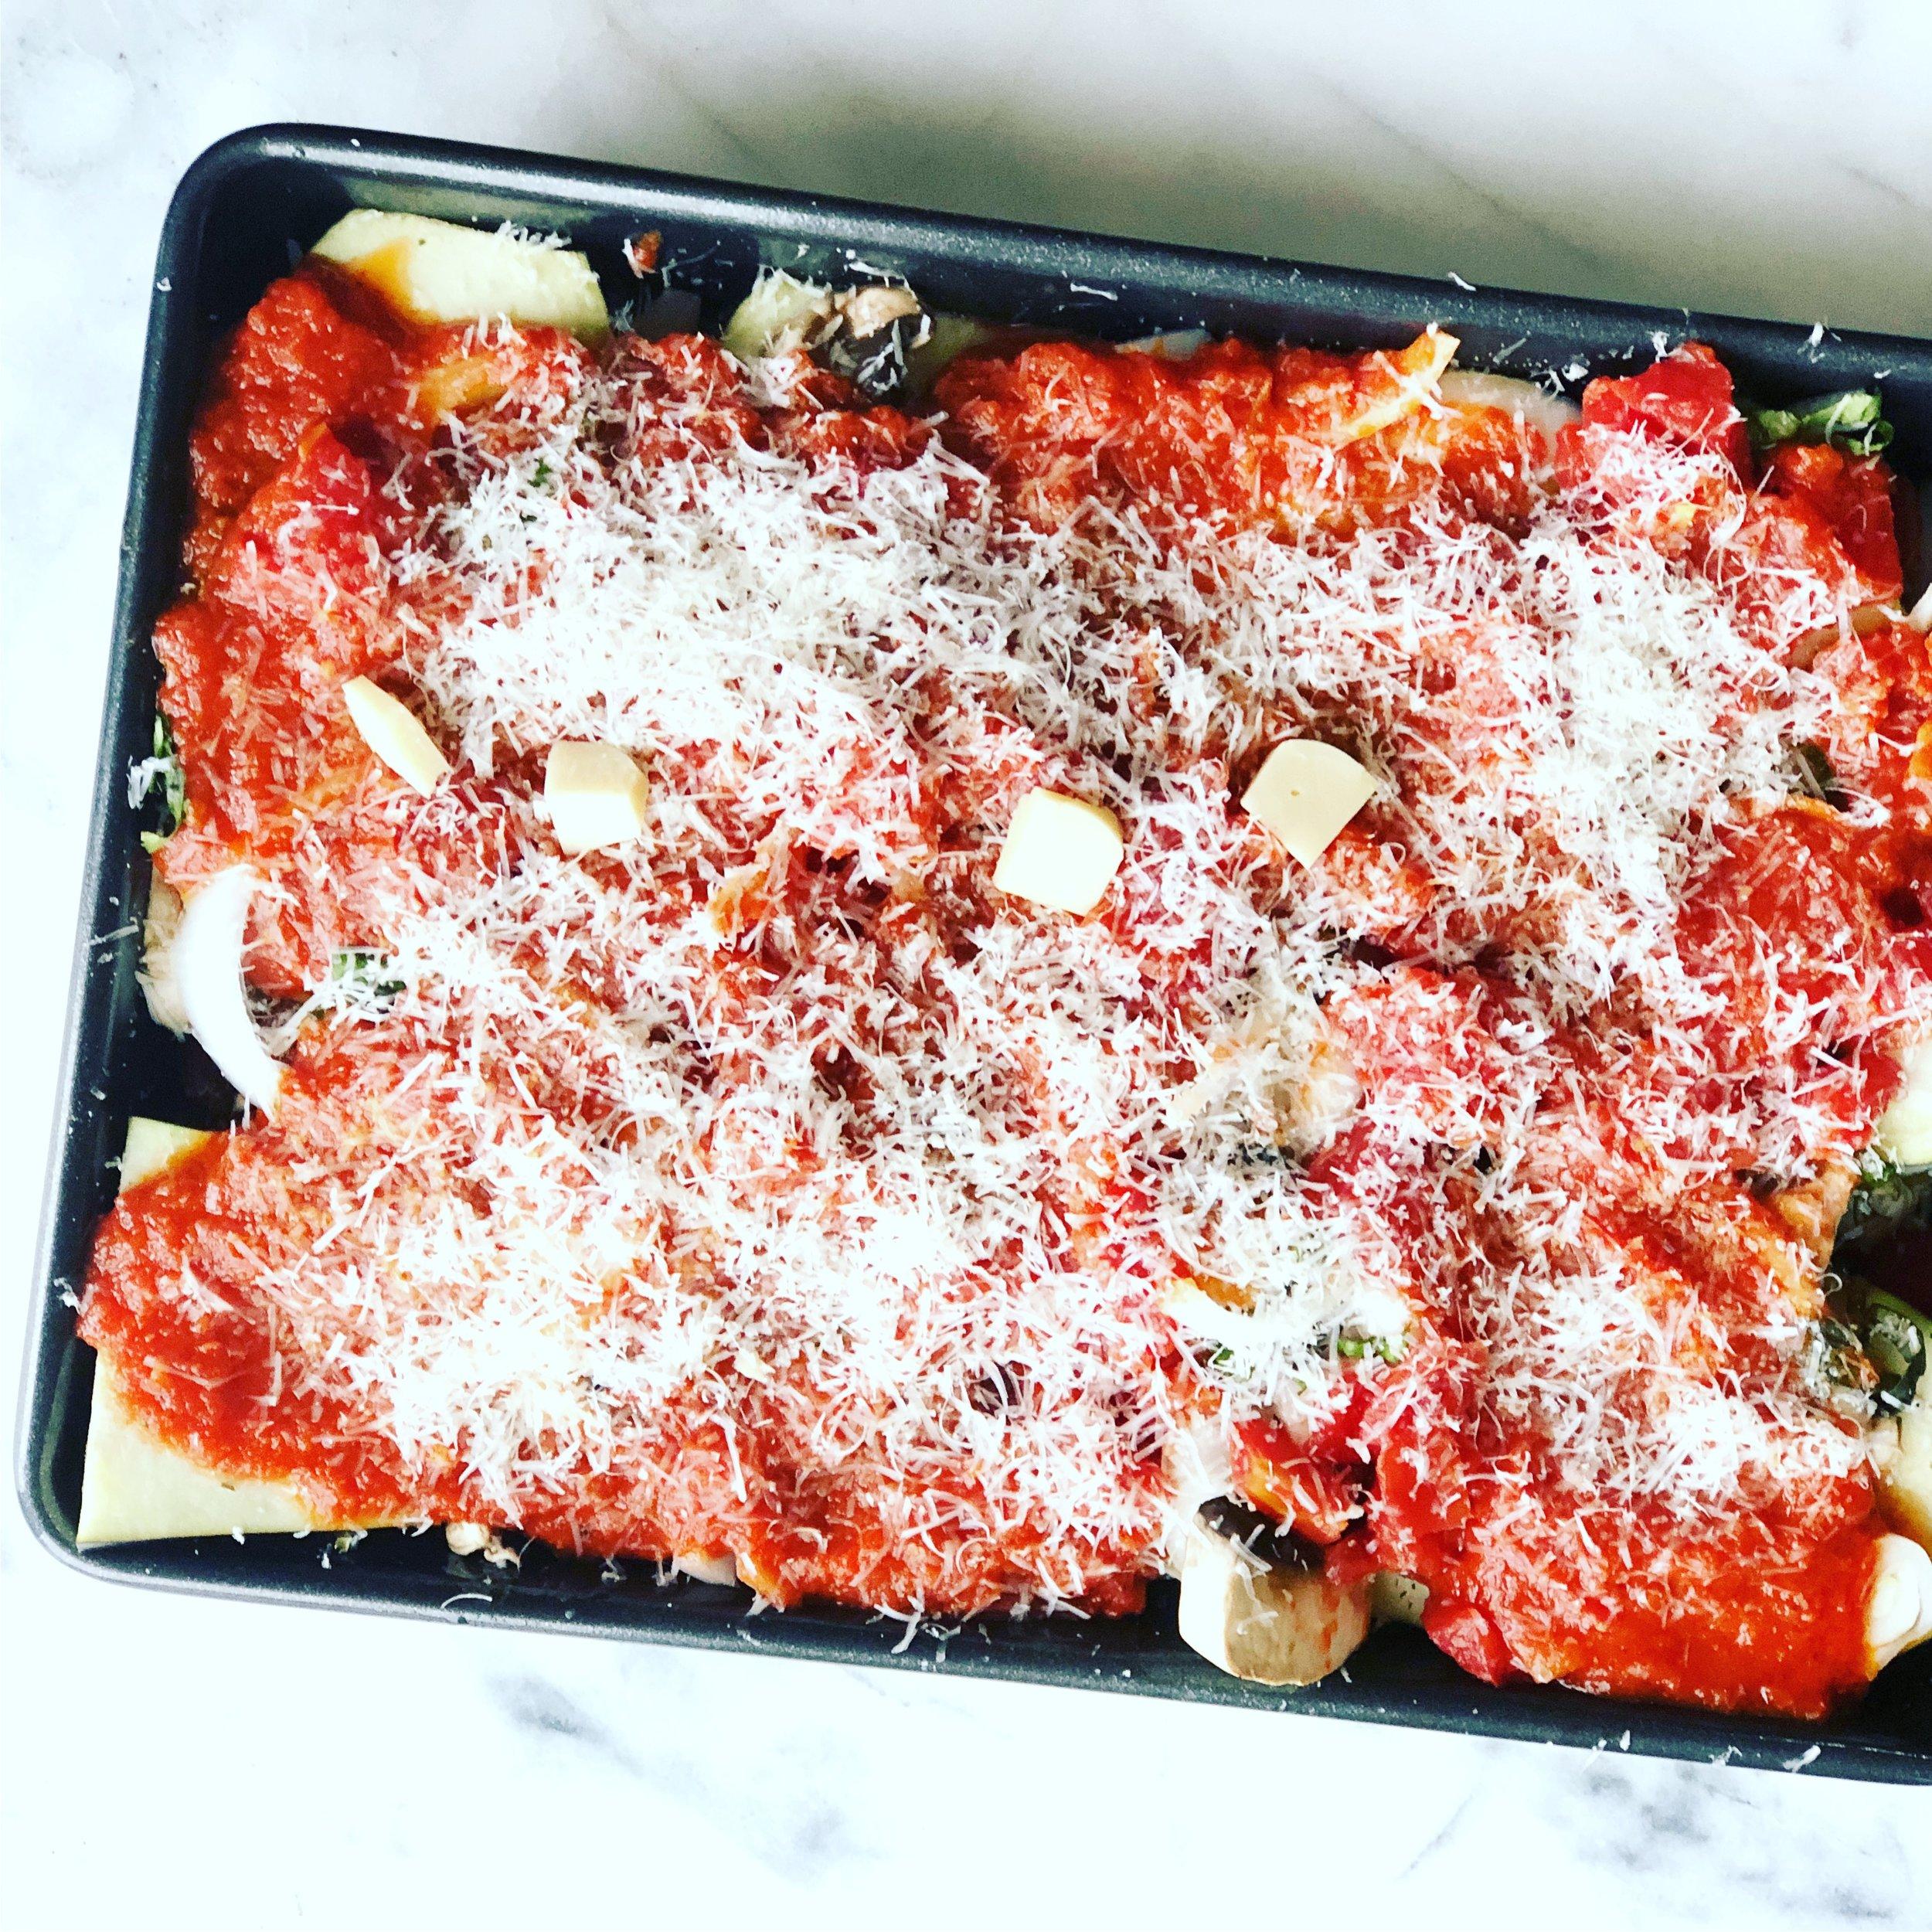 uncooked vegan eggplant lasagna.JPG